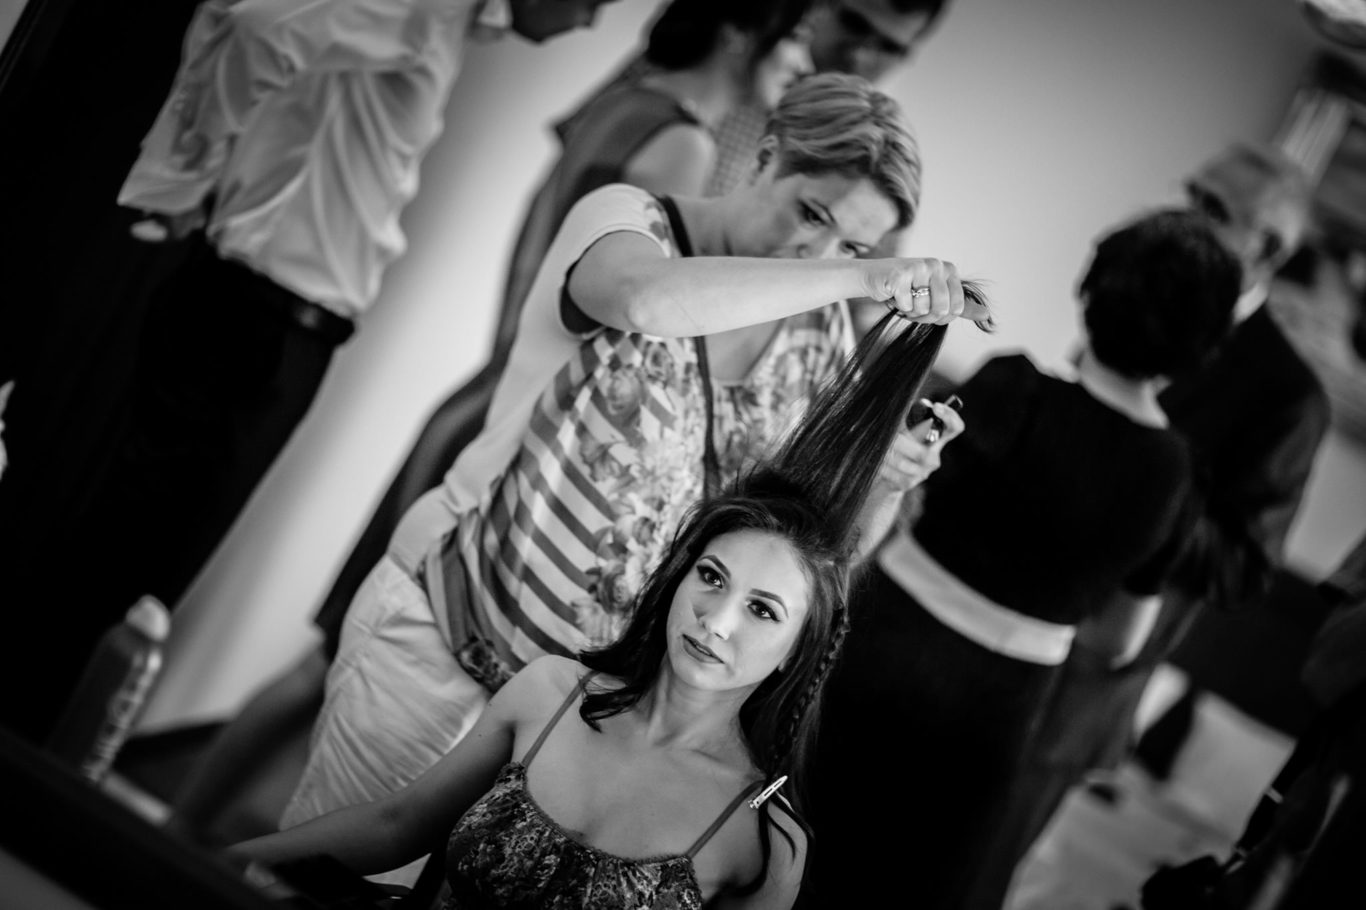 0019-fotografie-nunta-bucuresti-cristina-nicusor-fotograf-ciprian-dumitrescu-cd2_0688